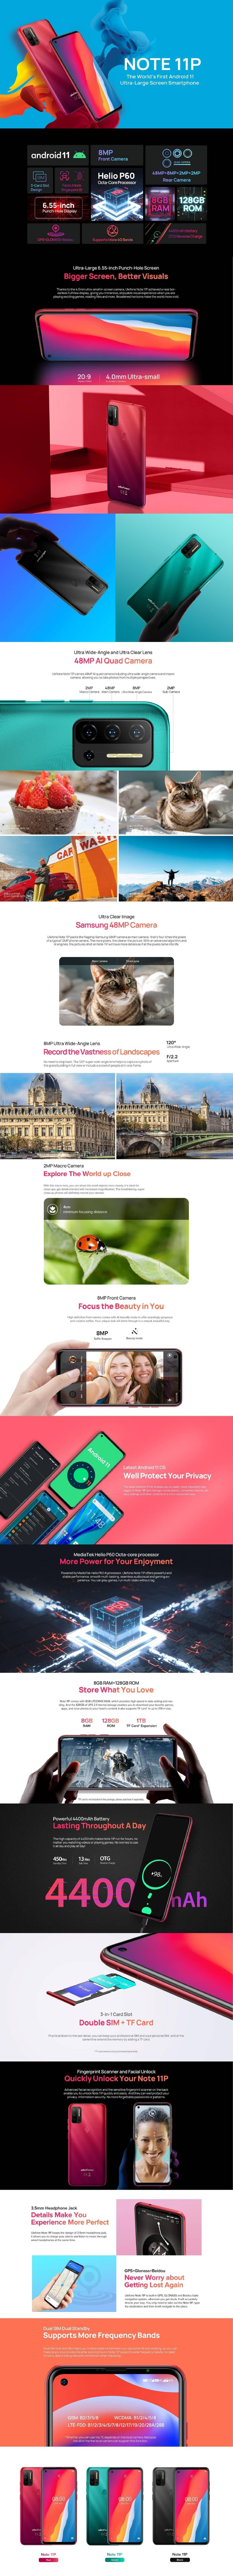 Ulefone-Note-11Pa560cf4b6d10d135.jpg